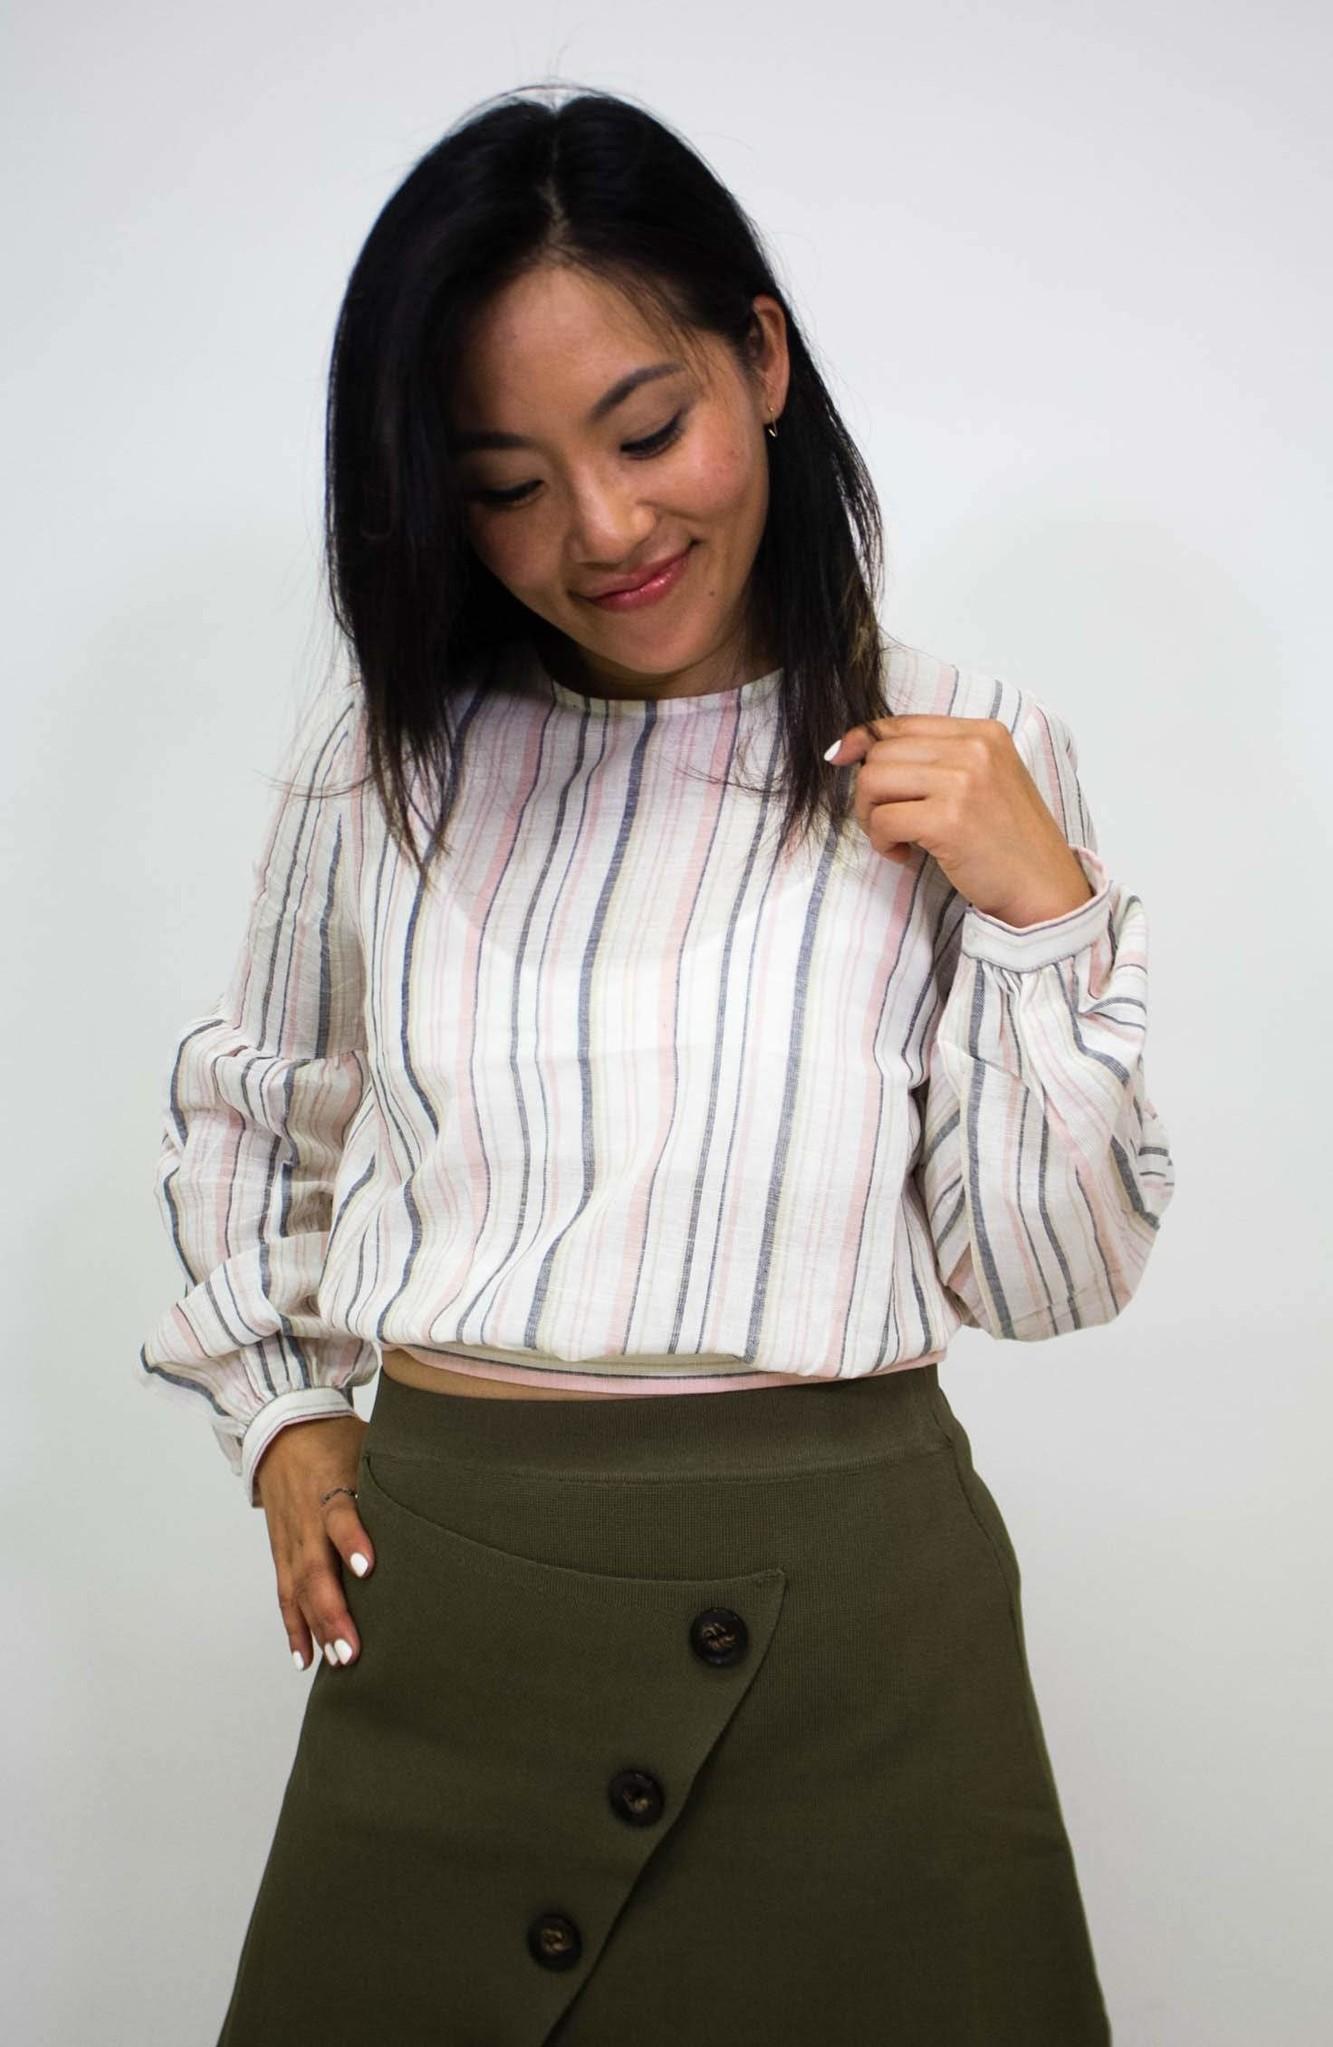 Mod Ref Olive Ollie Skirt